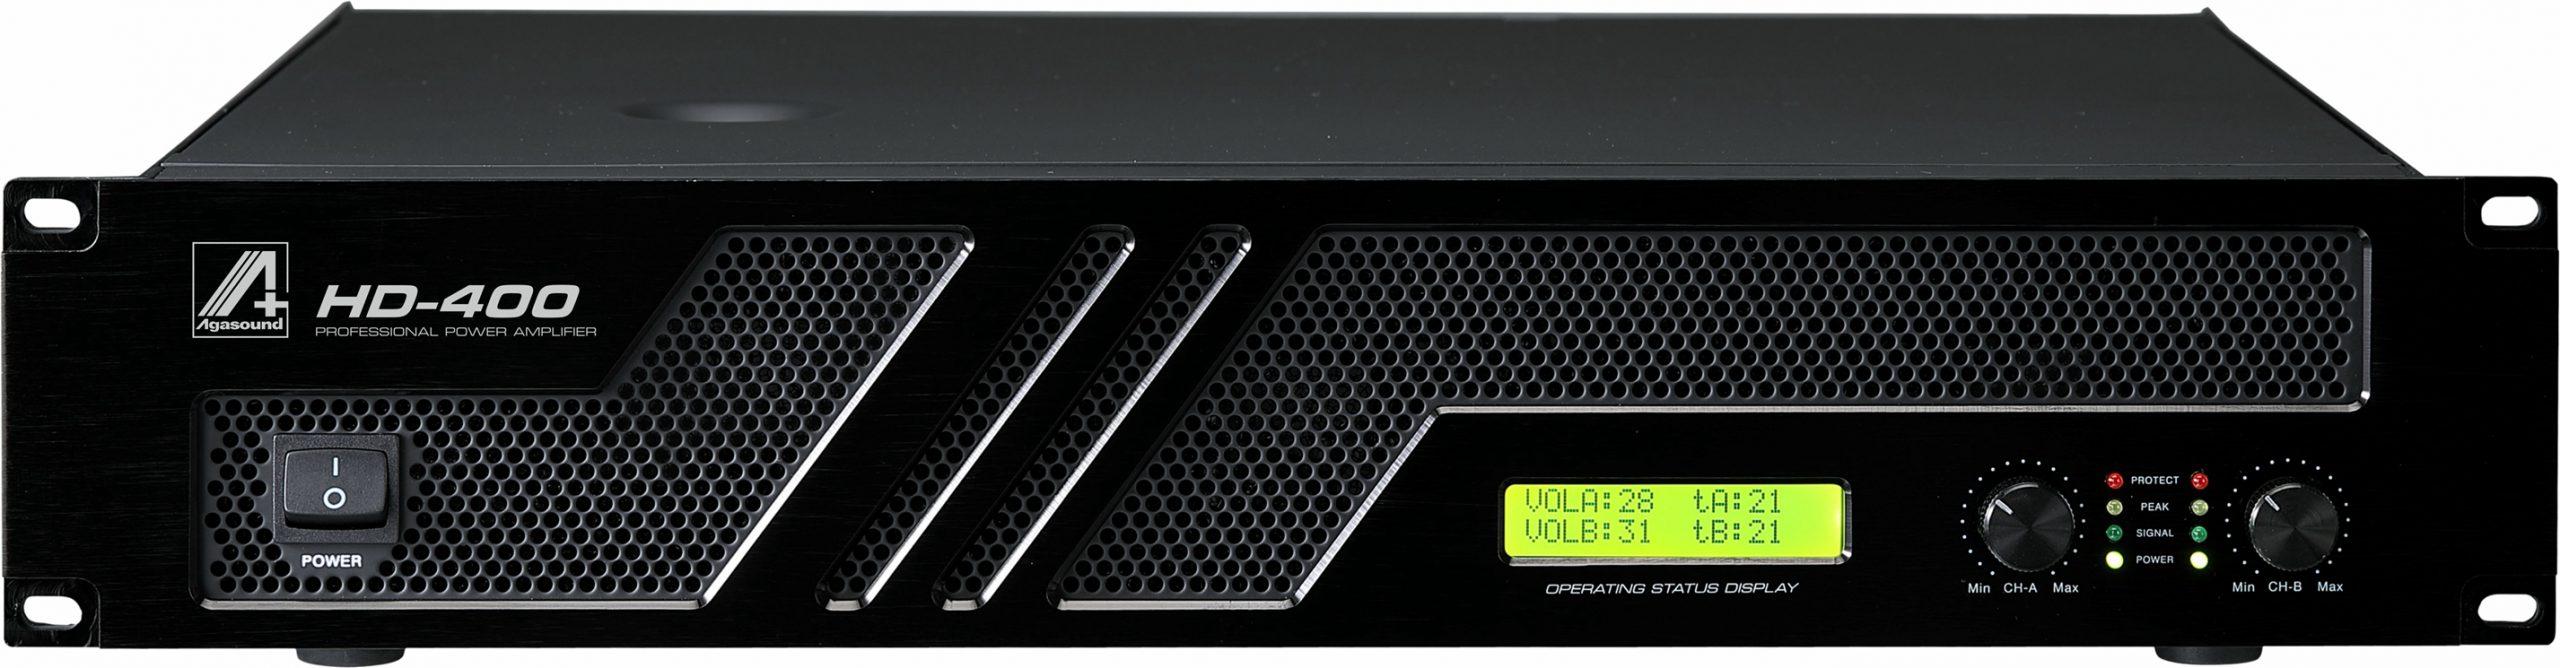 Công suất Agasound HD-400